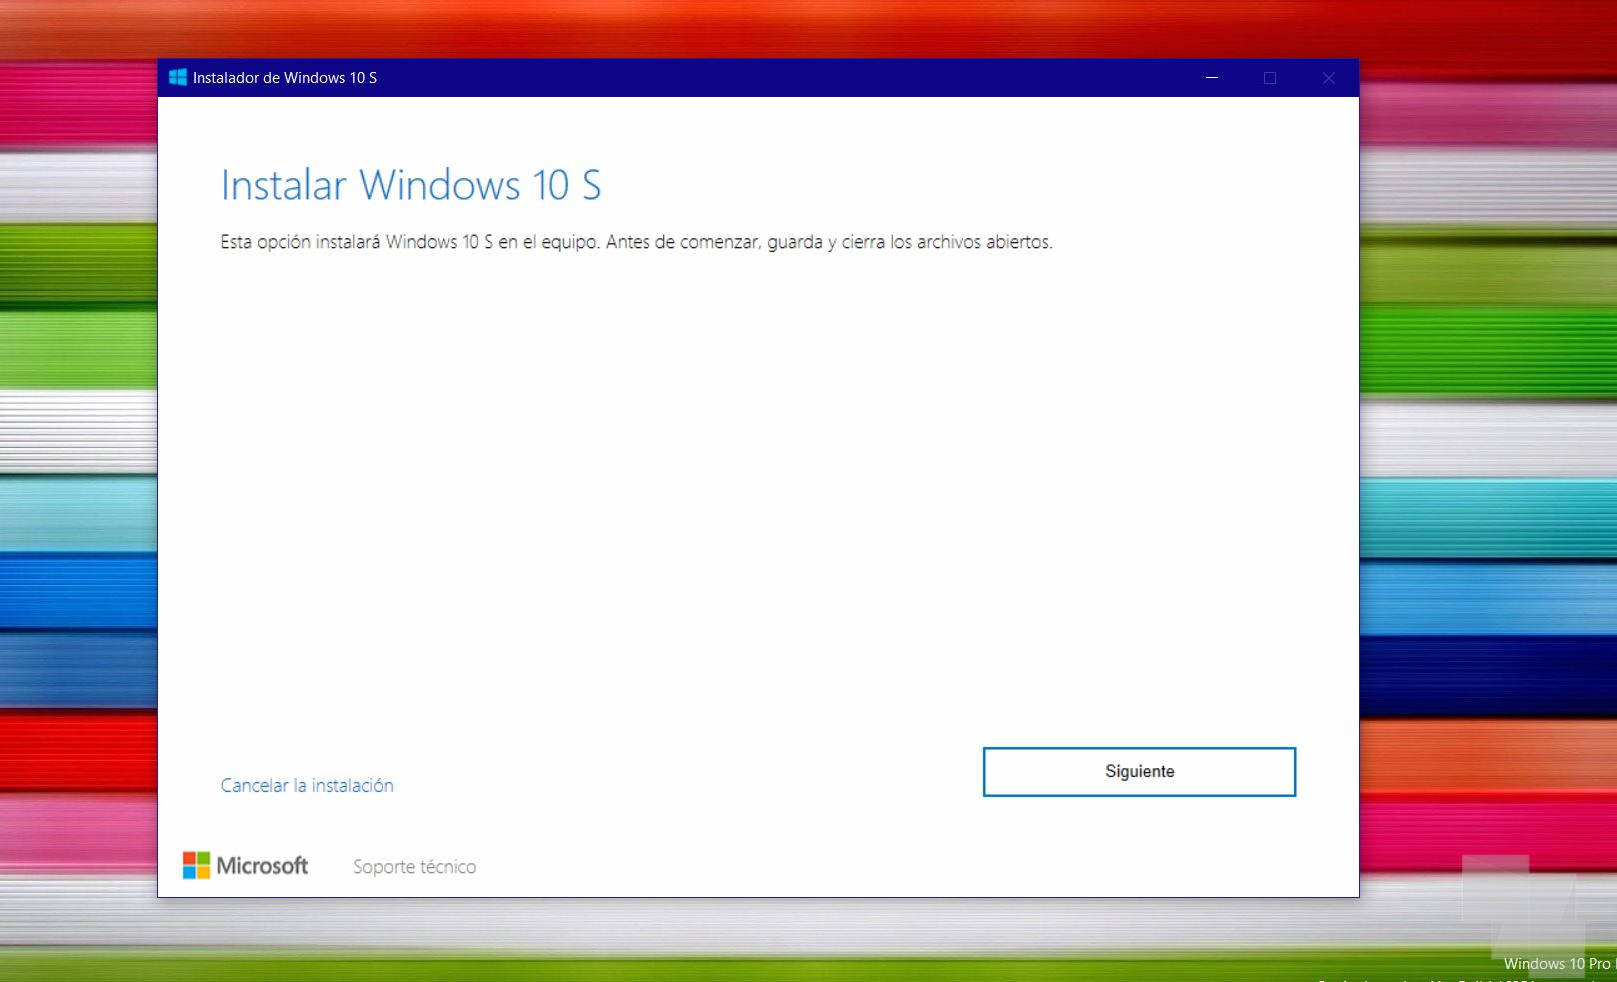 instalar windows 10 s